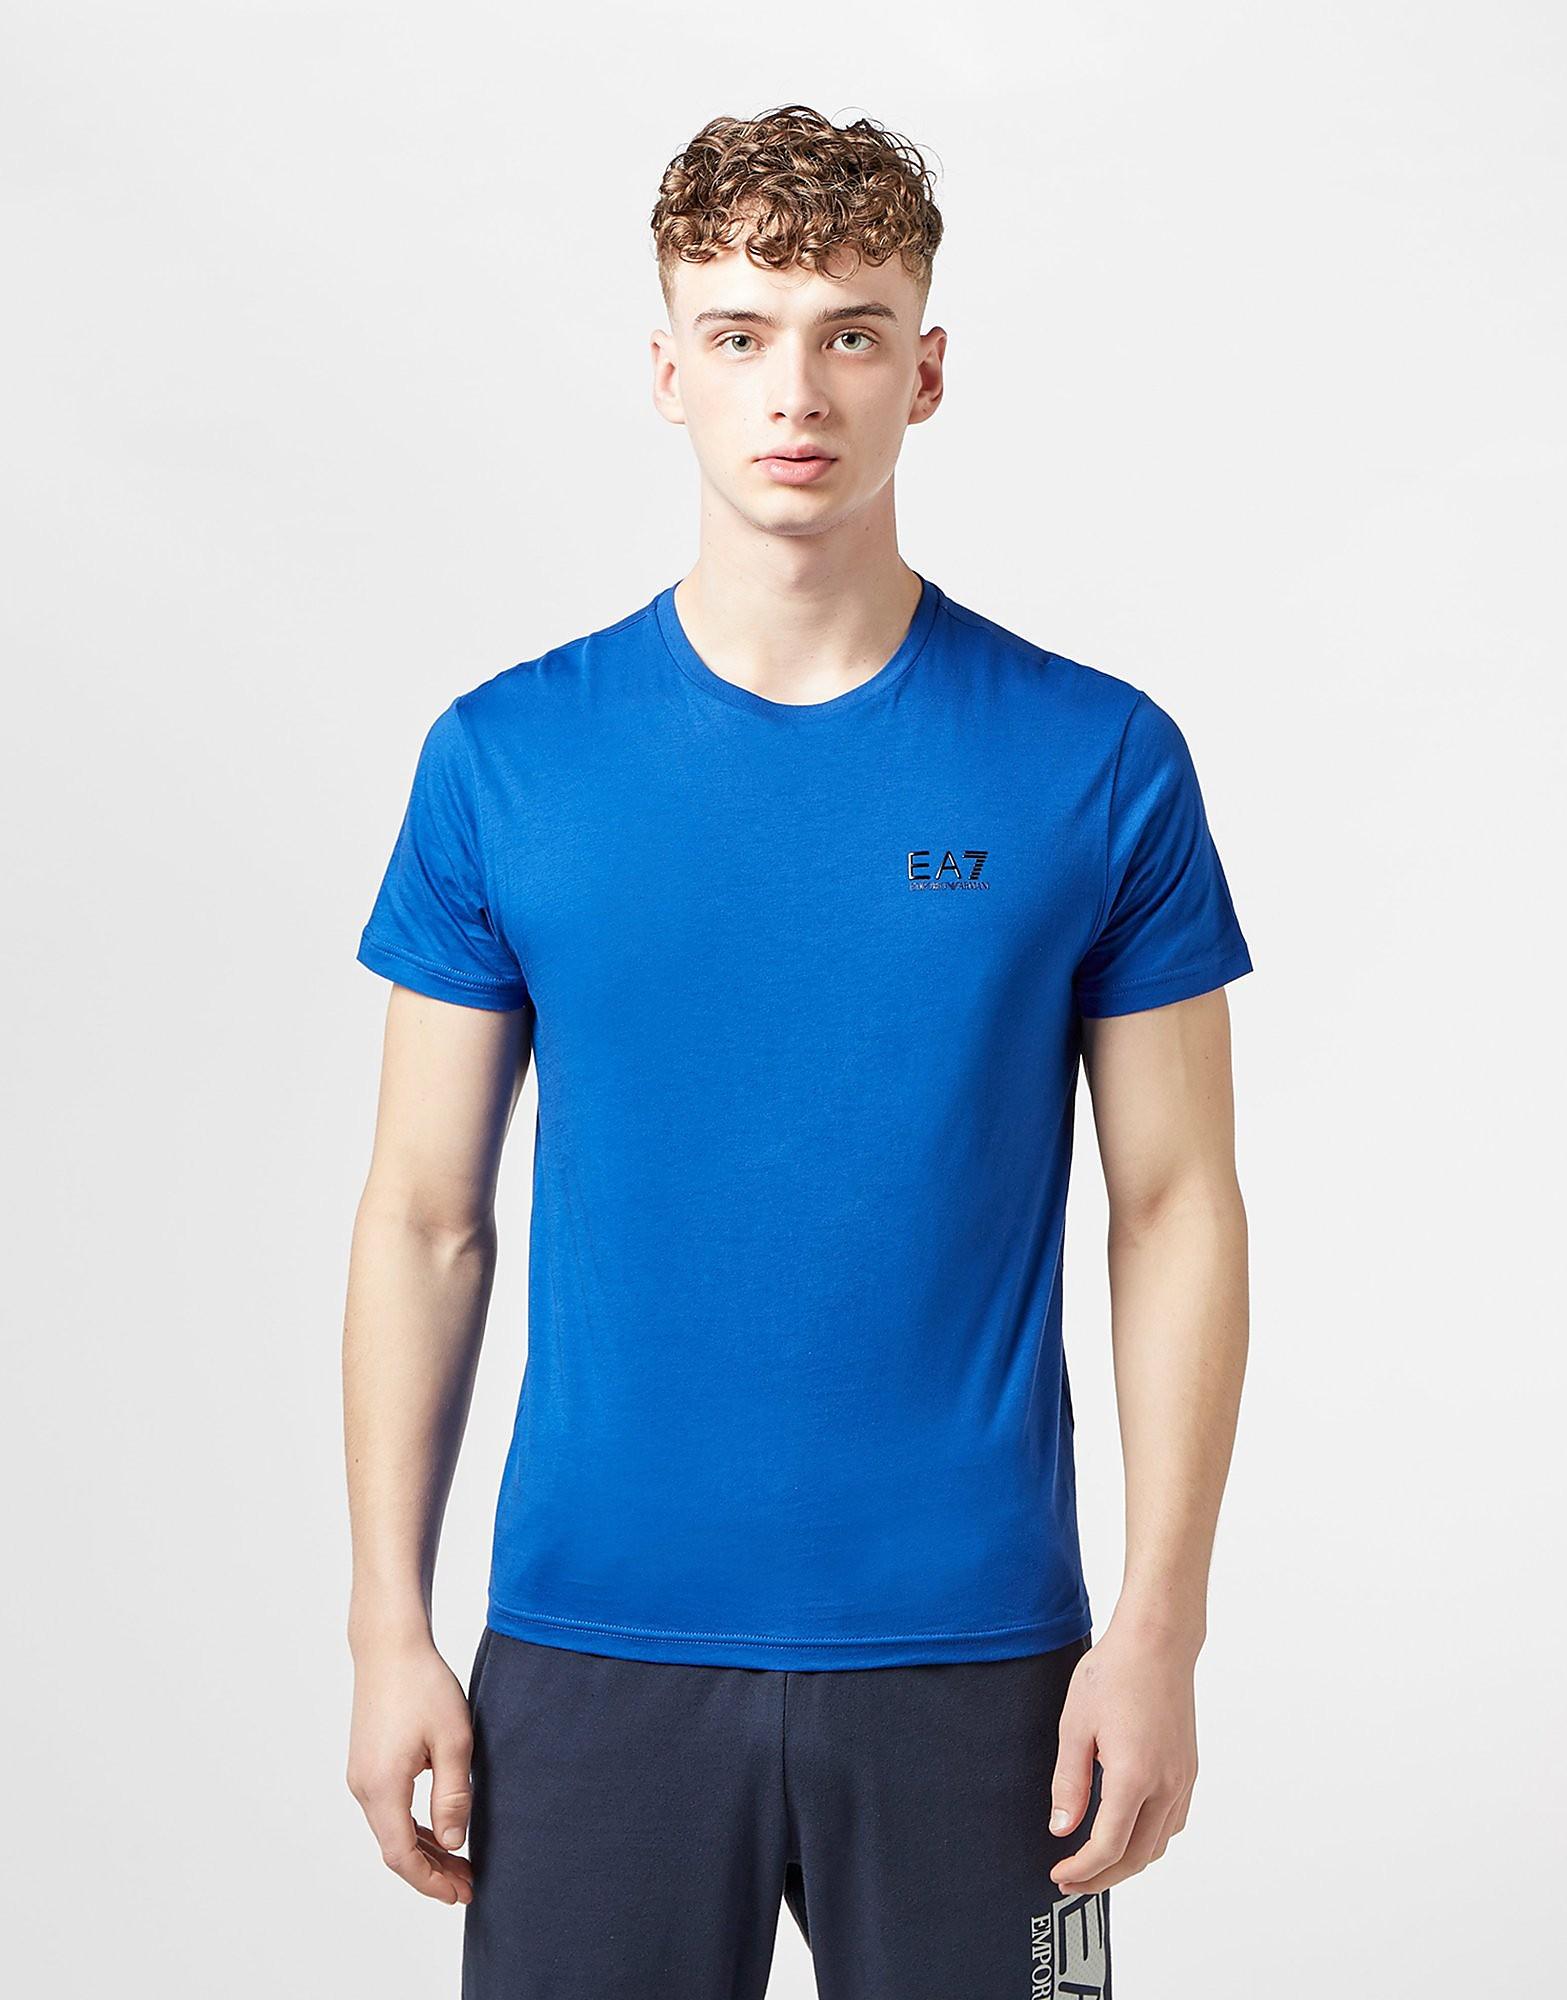 cdd4514aab3ef Emporio Armani EA7 Core Short Sleeve T-Shirt - Blue, Blue - £40.00 -  Bullring & Grand Central